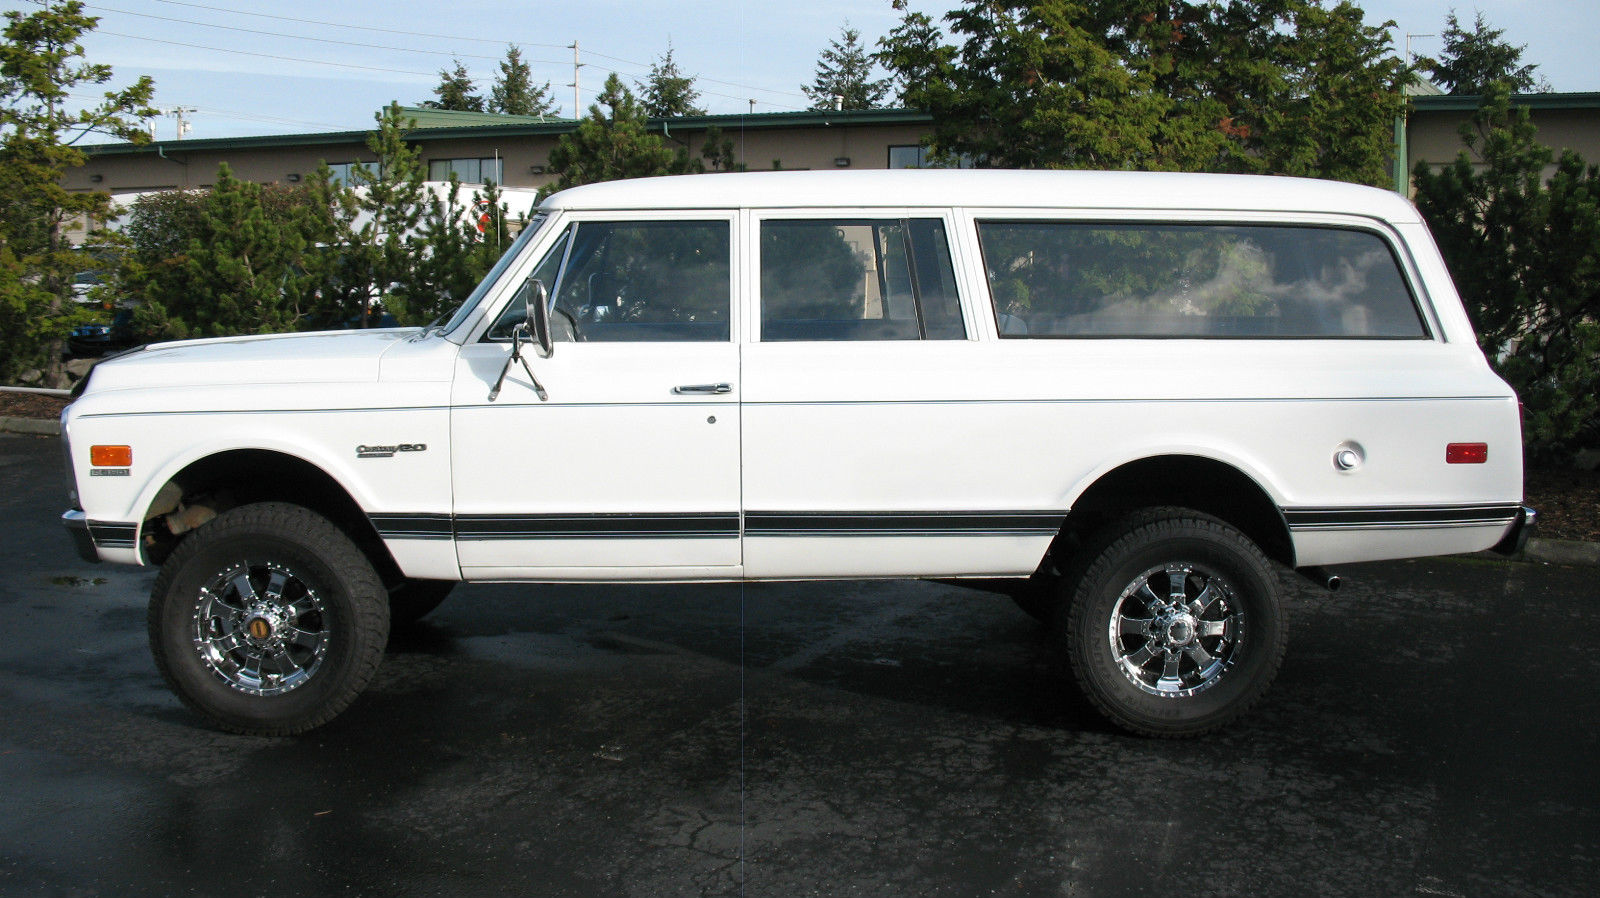 1972 Chevrolet 3 4 Ton 4x4 Suburban Classic Chevrolet Suburban 1972 For Sale